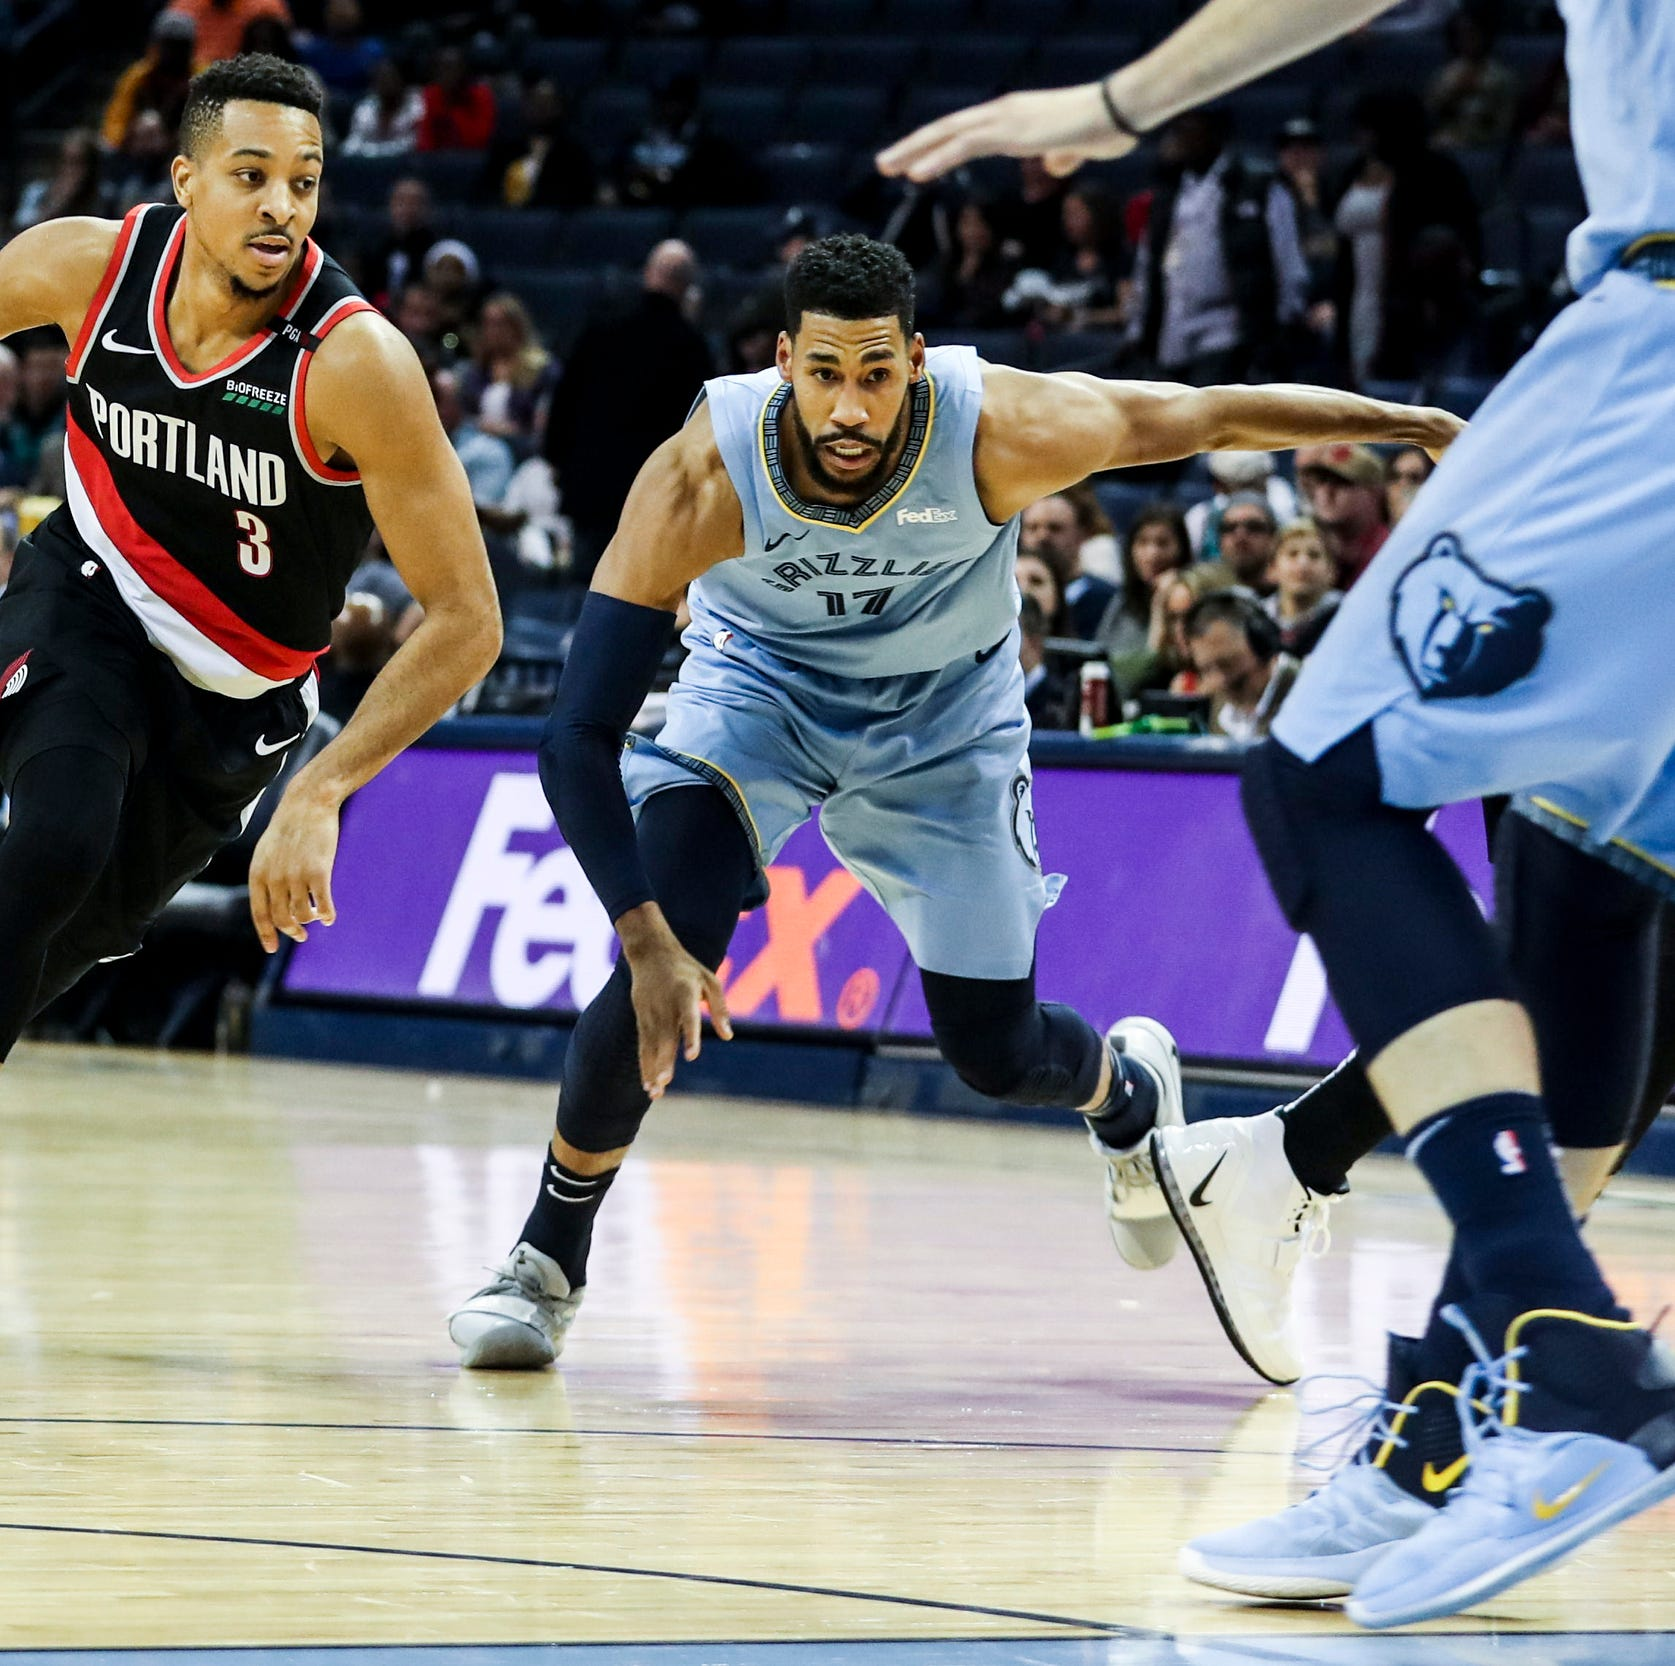 Game Recap: Memphis Grizzlies 92, Portland Trail Blazers 83